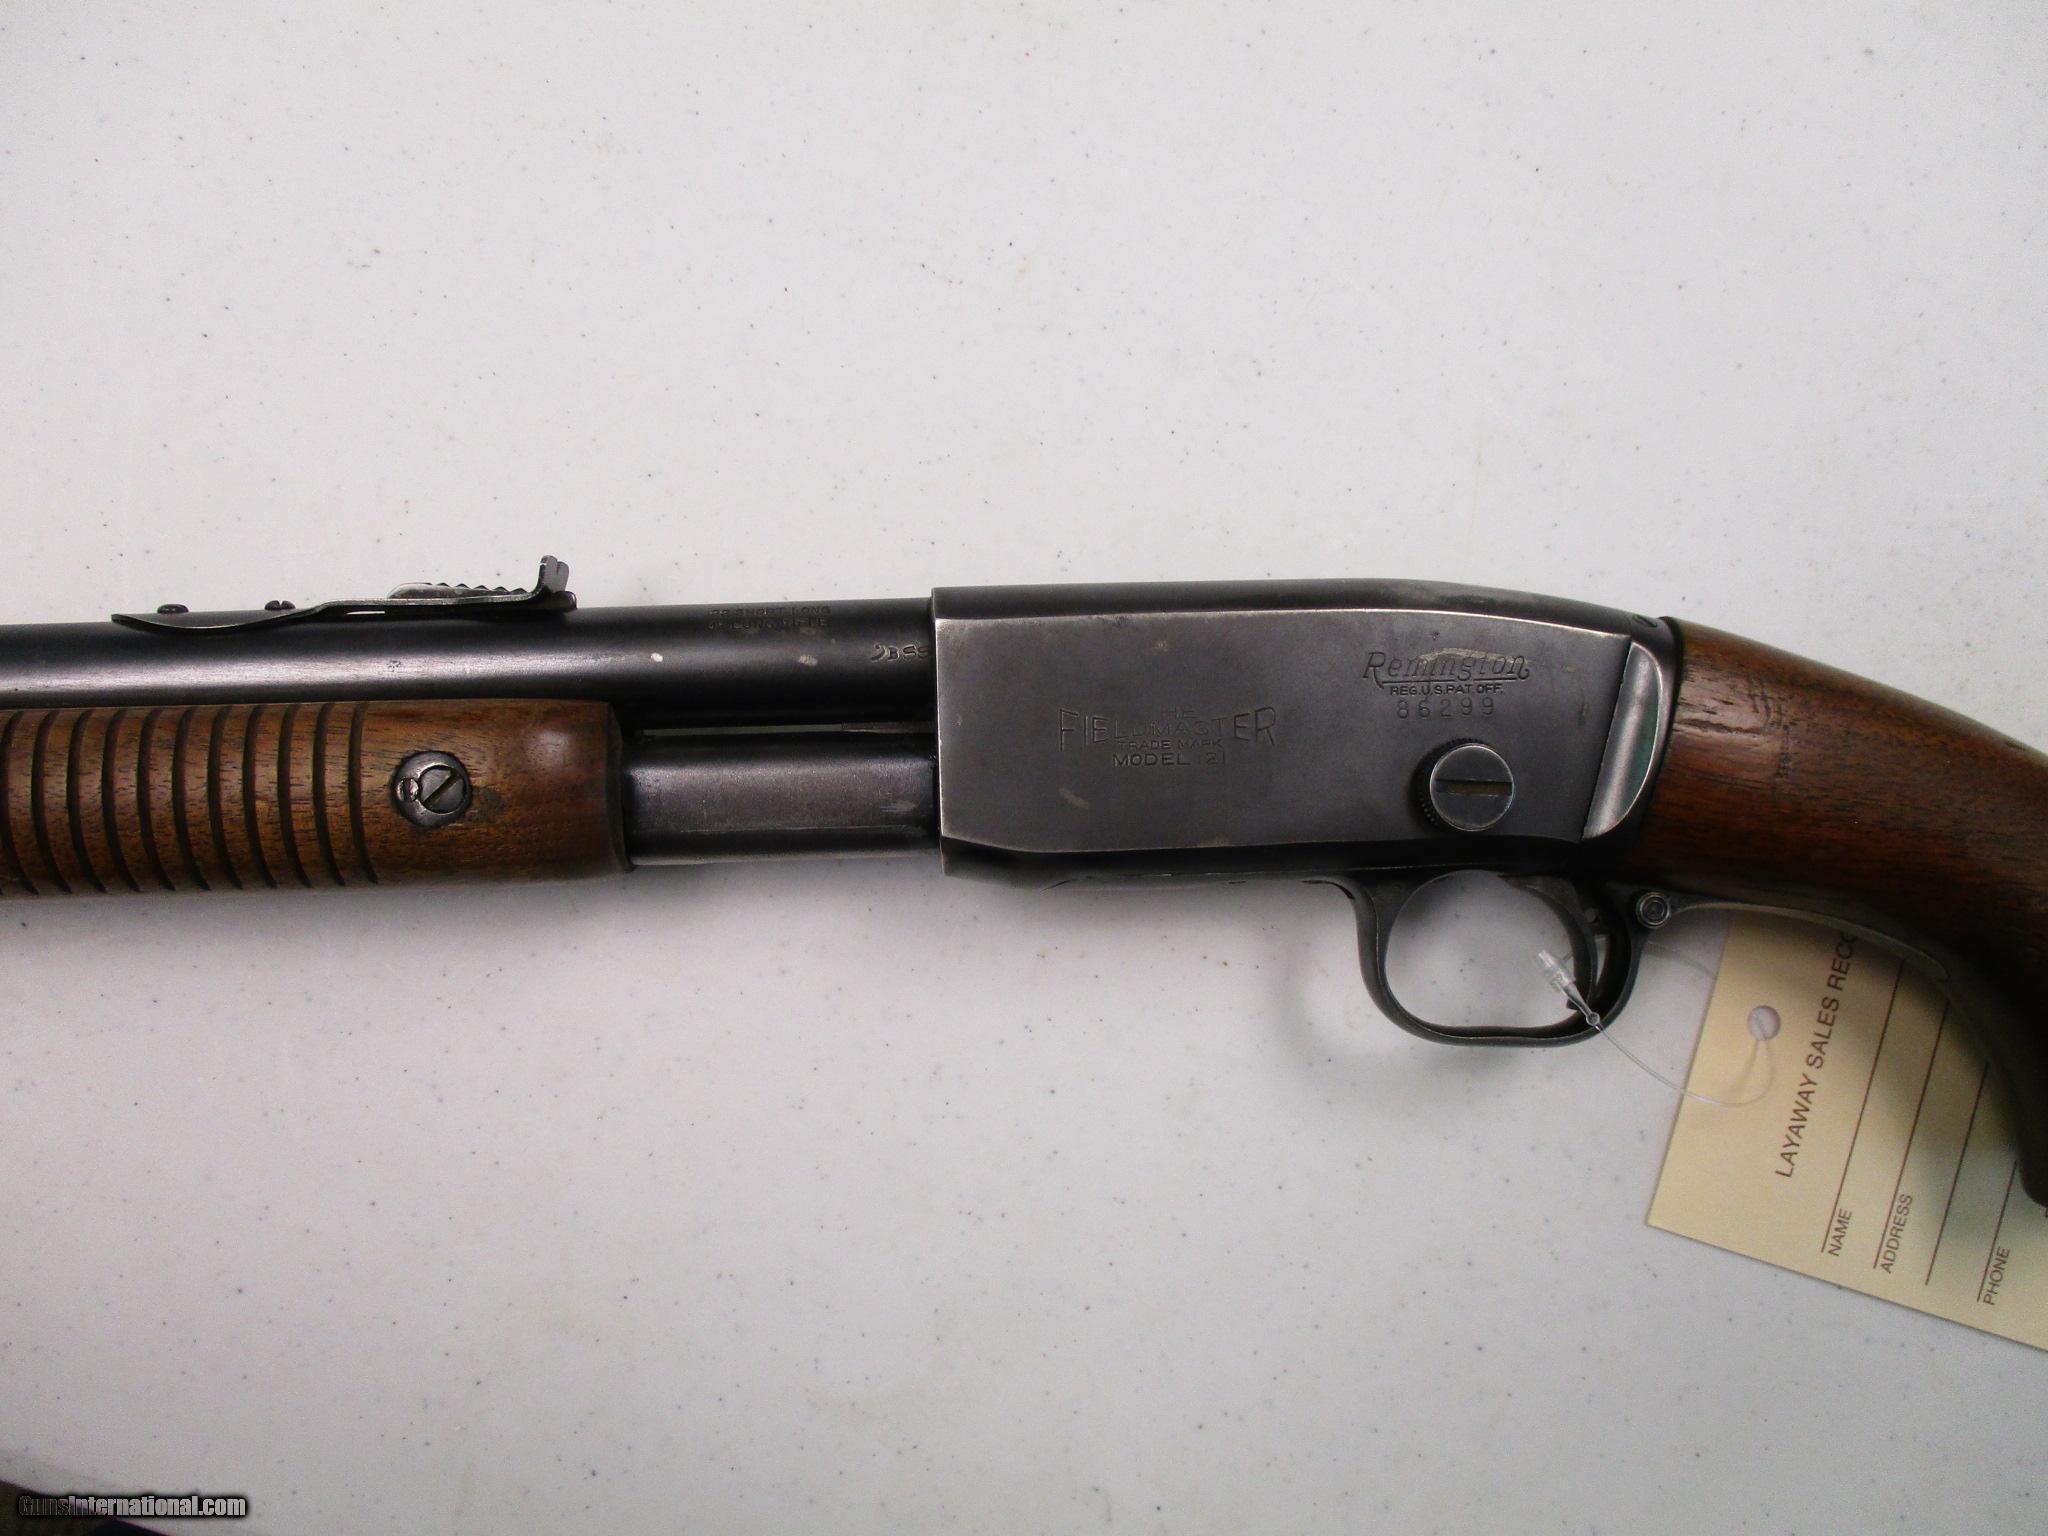 Remington 121 Fieldmaster, 22 lr, pump action, nice!